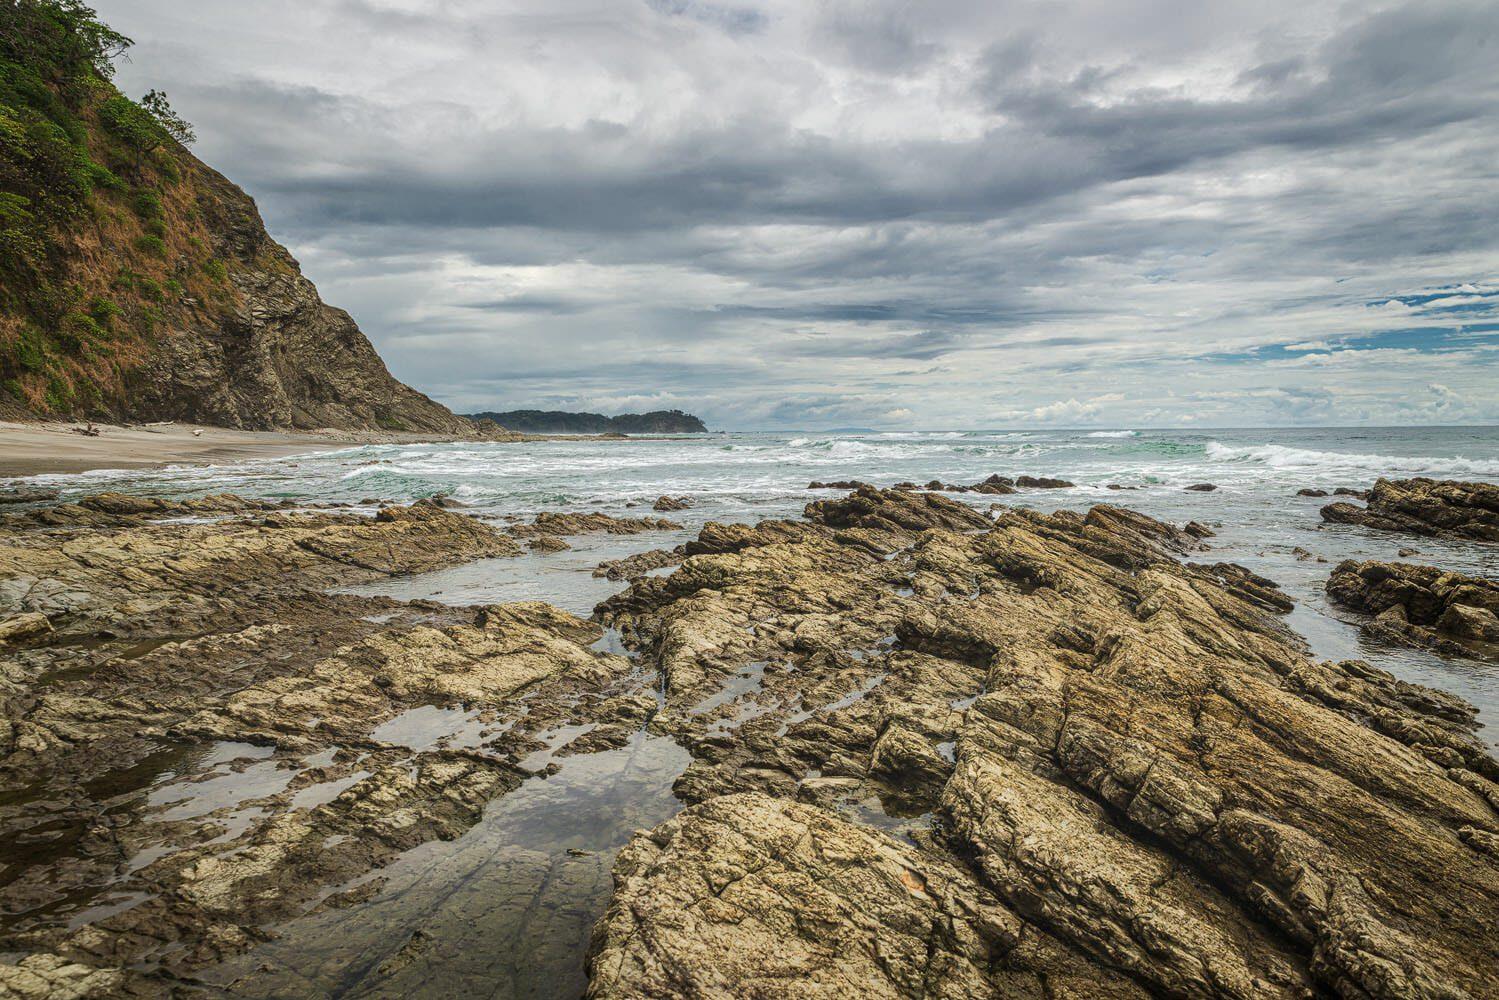 Rocky peninsula of playa bonita-Samara